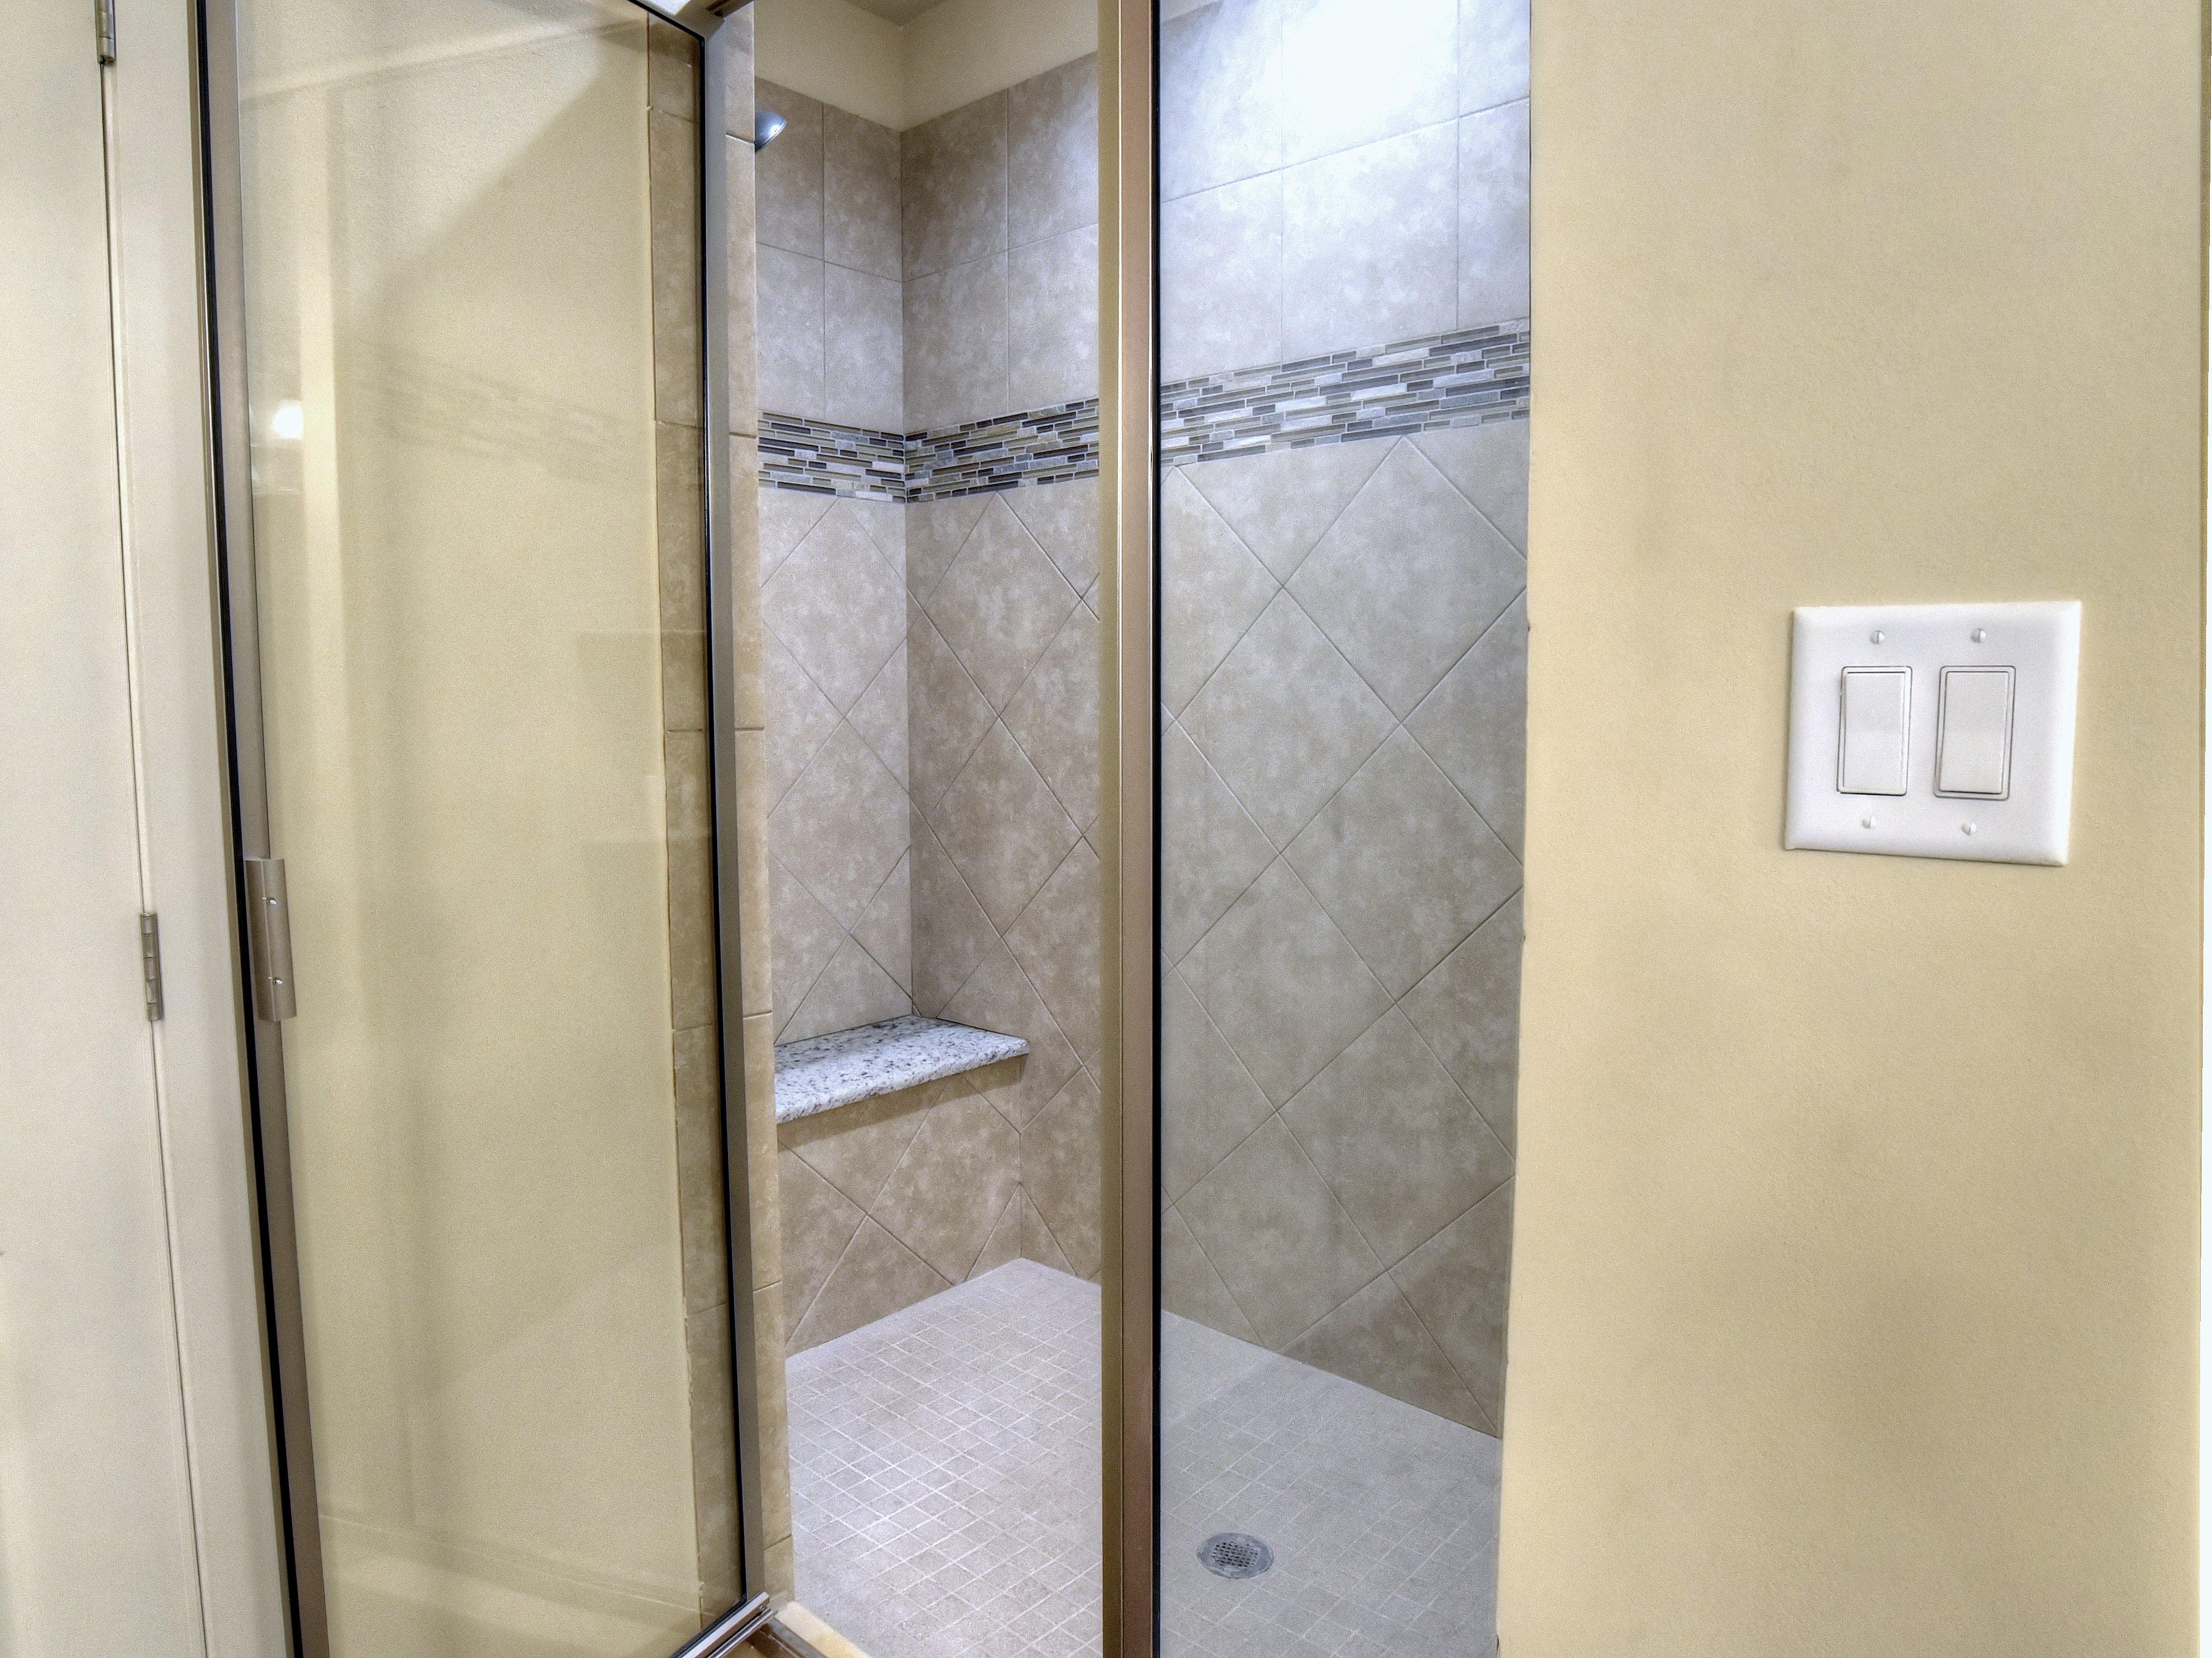 93 Beacon Point Condo rental in Sandestin Rentals ~ Cottages and Villas  in Destin Florida - #16